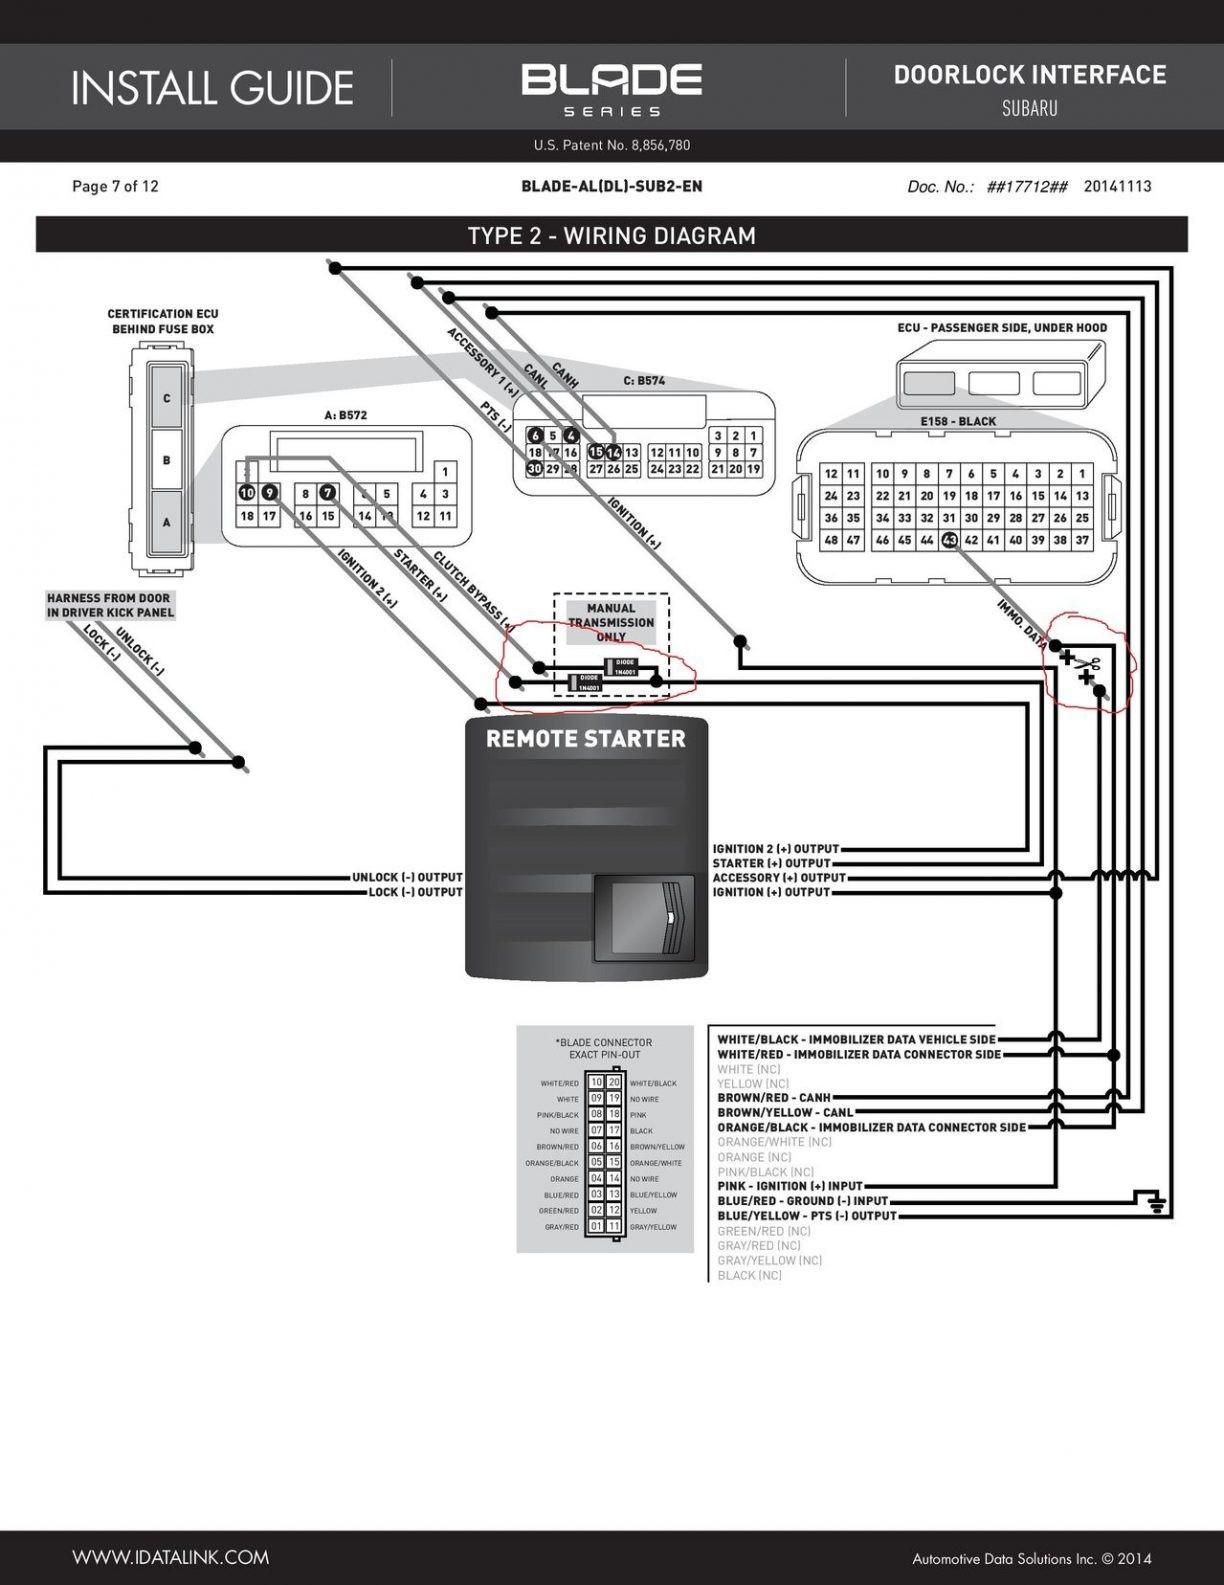 Remote Starter Wiring Diagrams Modern Gmdlbp Wiring Diagram S Best for Wiring Diagram Of Remote Starter Wiring Diagrams